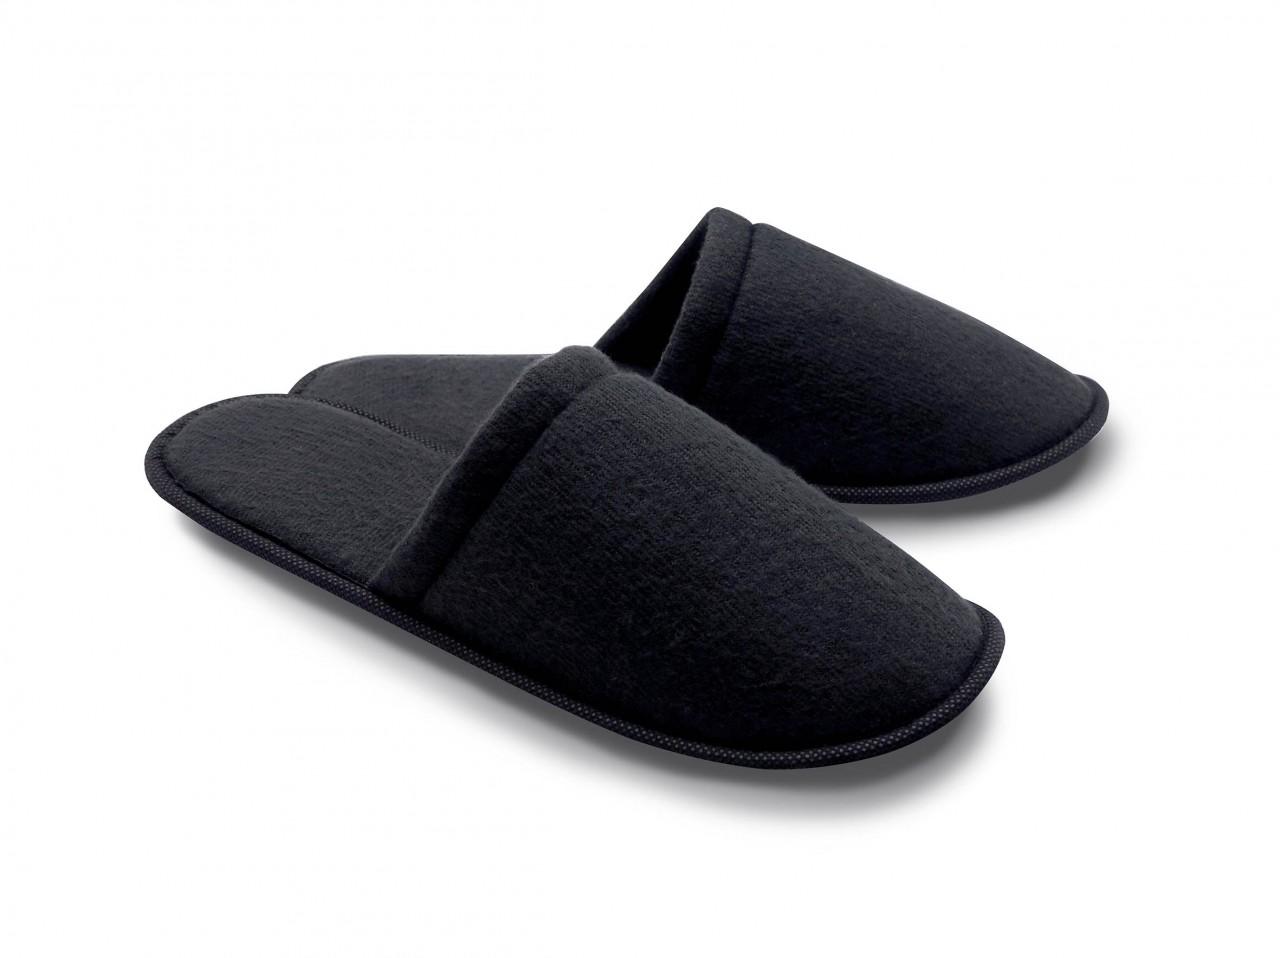 Frottee-Slipper schwarz, vorne geschlossen